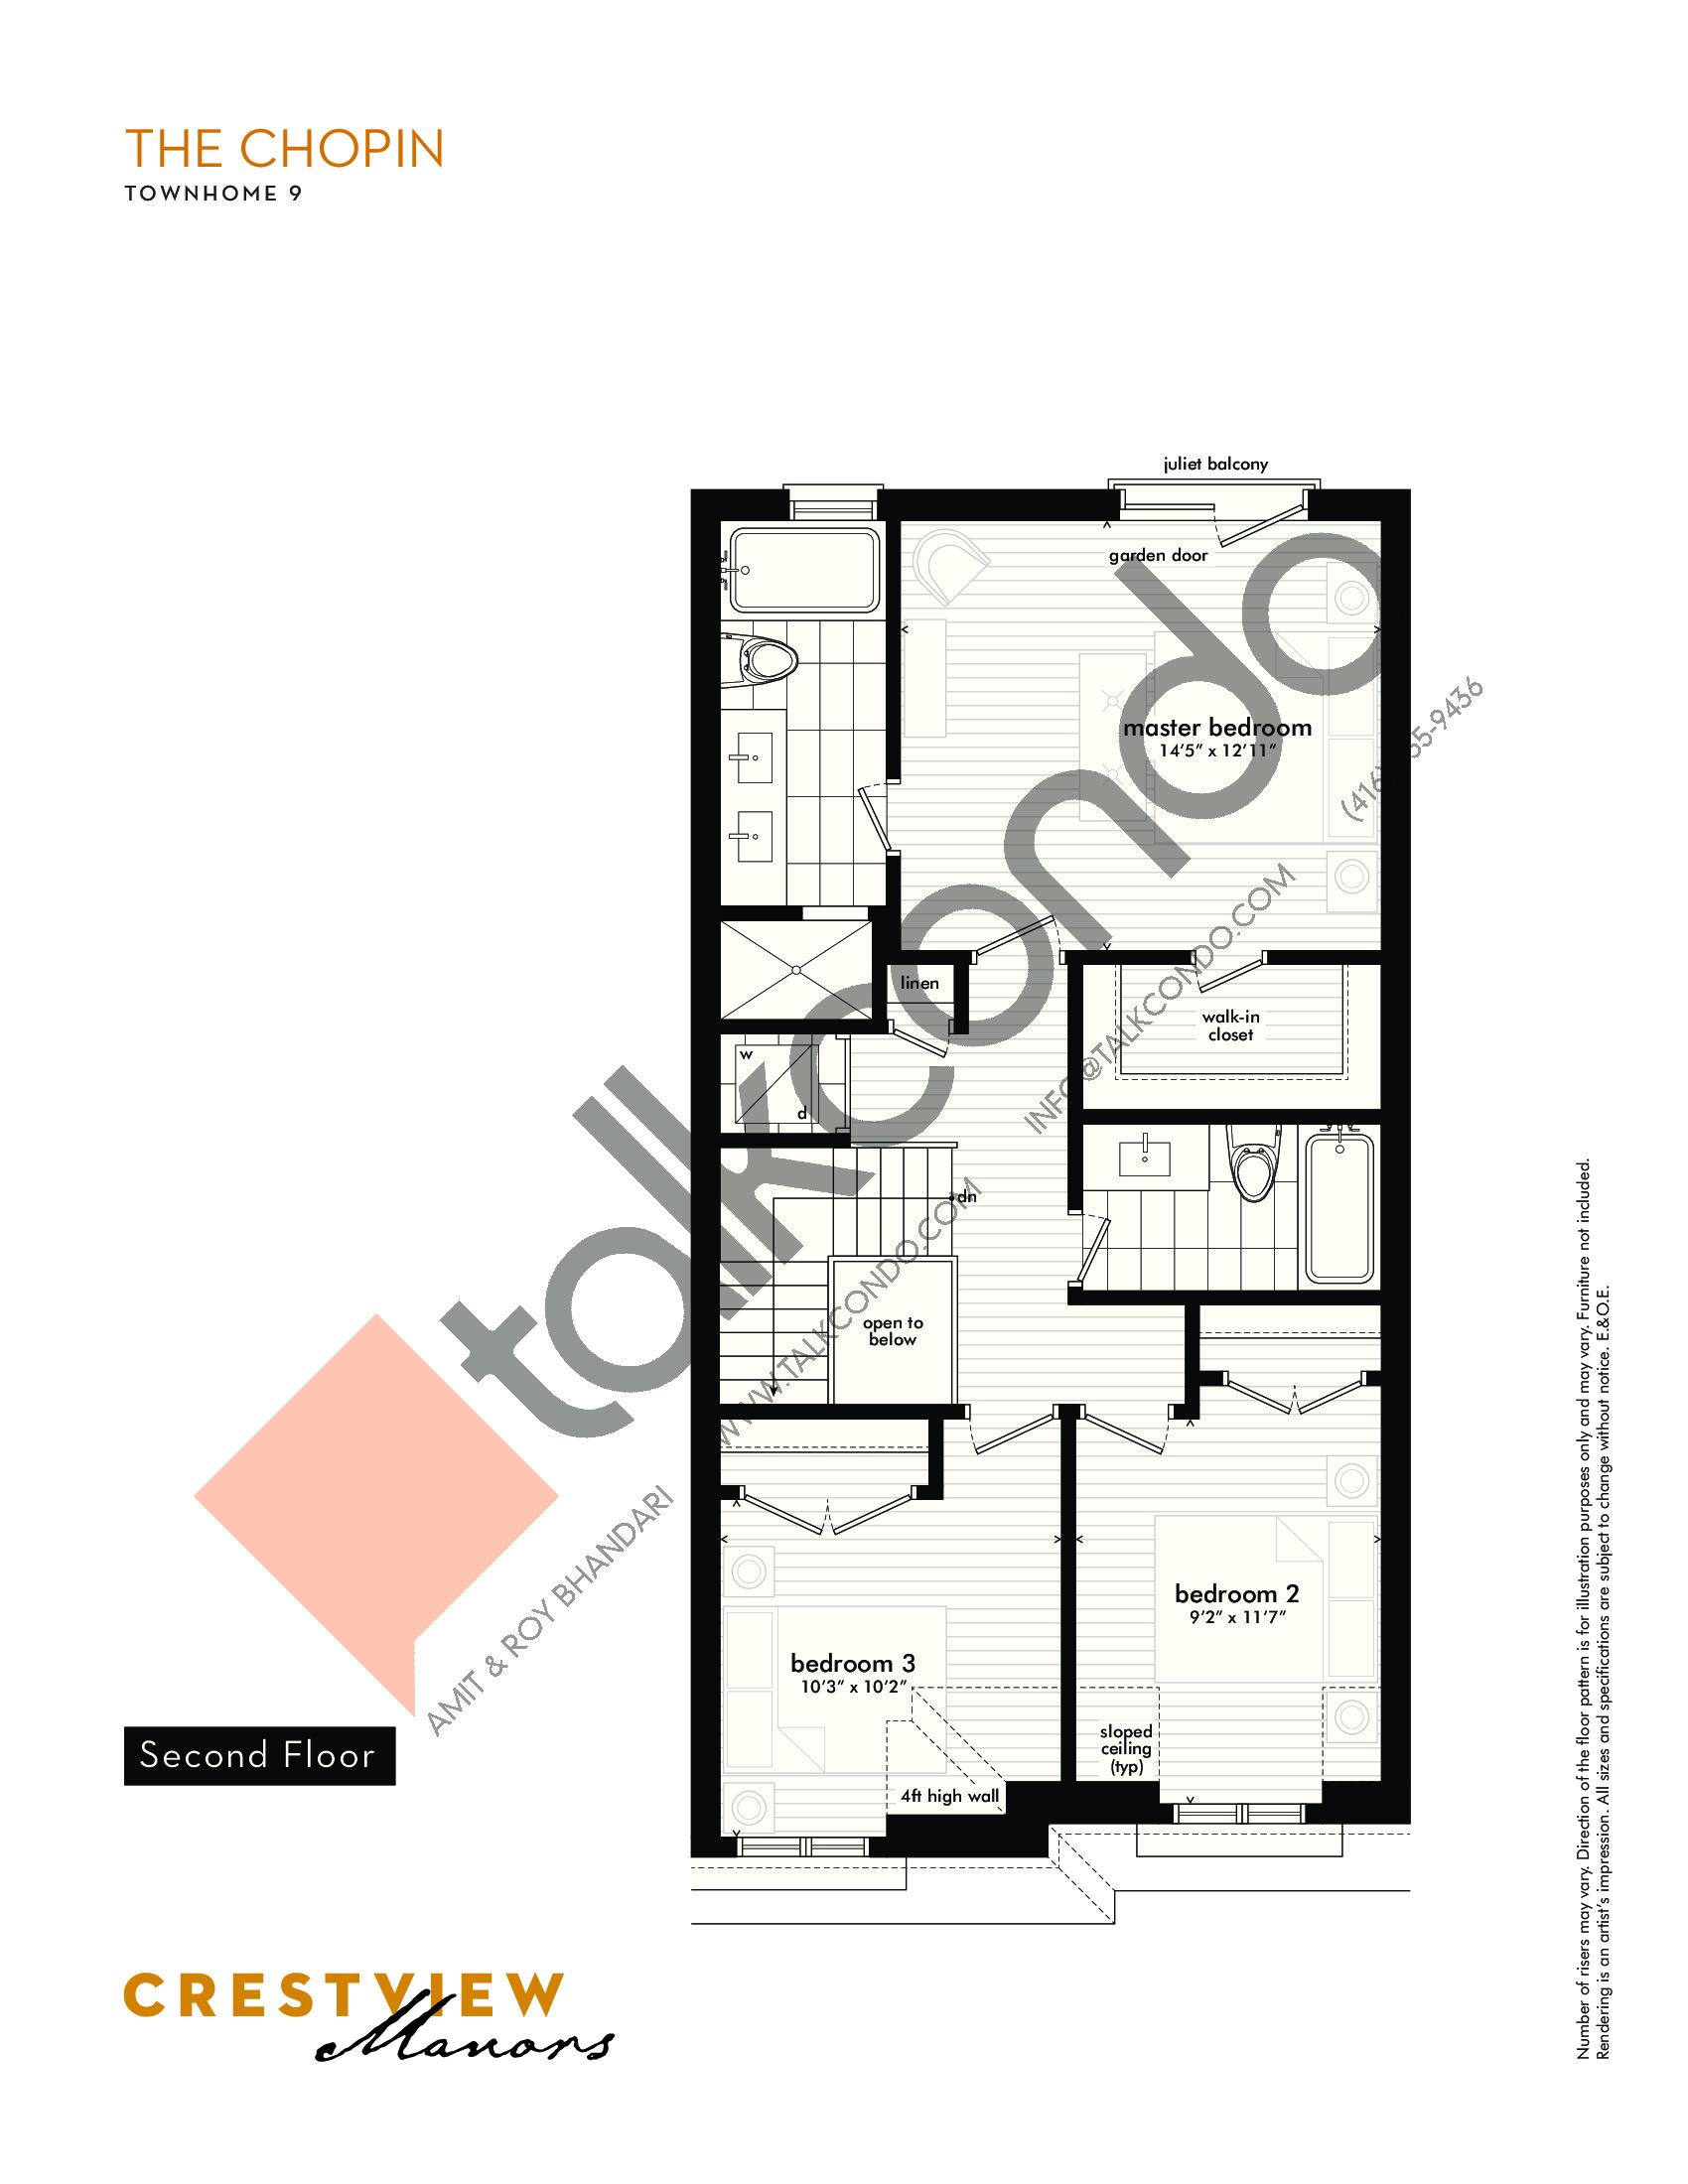 The Chopin - Second Floor Floor Plan at Crestview Manors - 2241 sq.ft